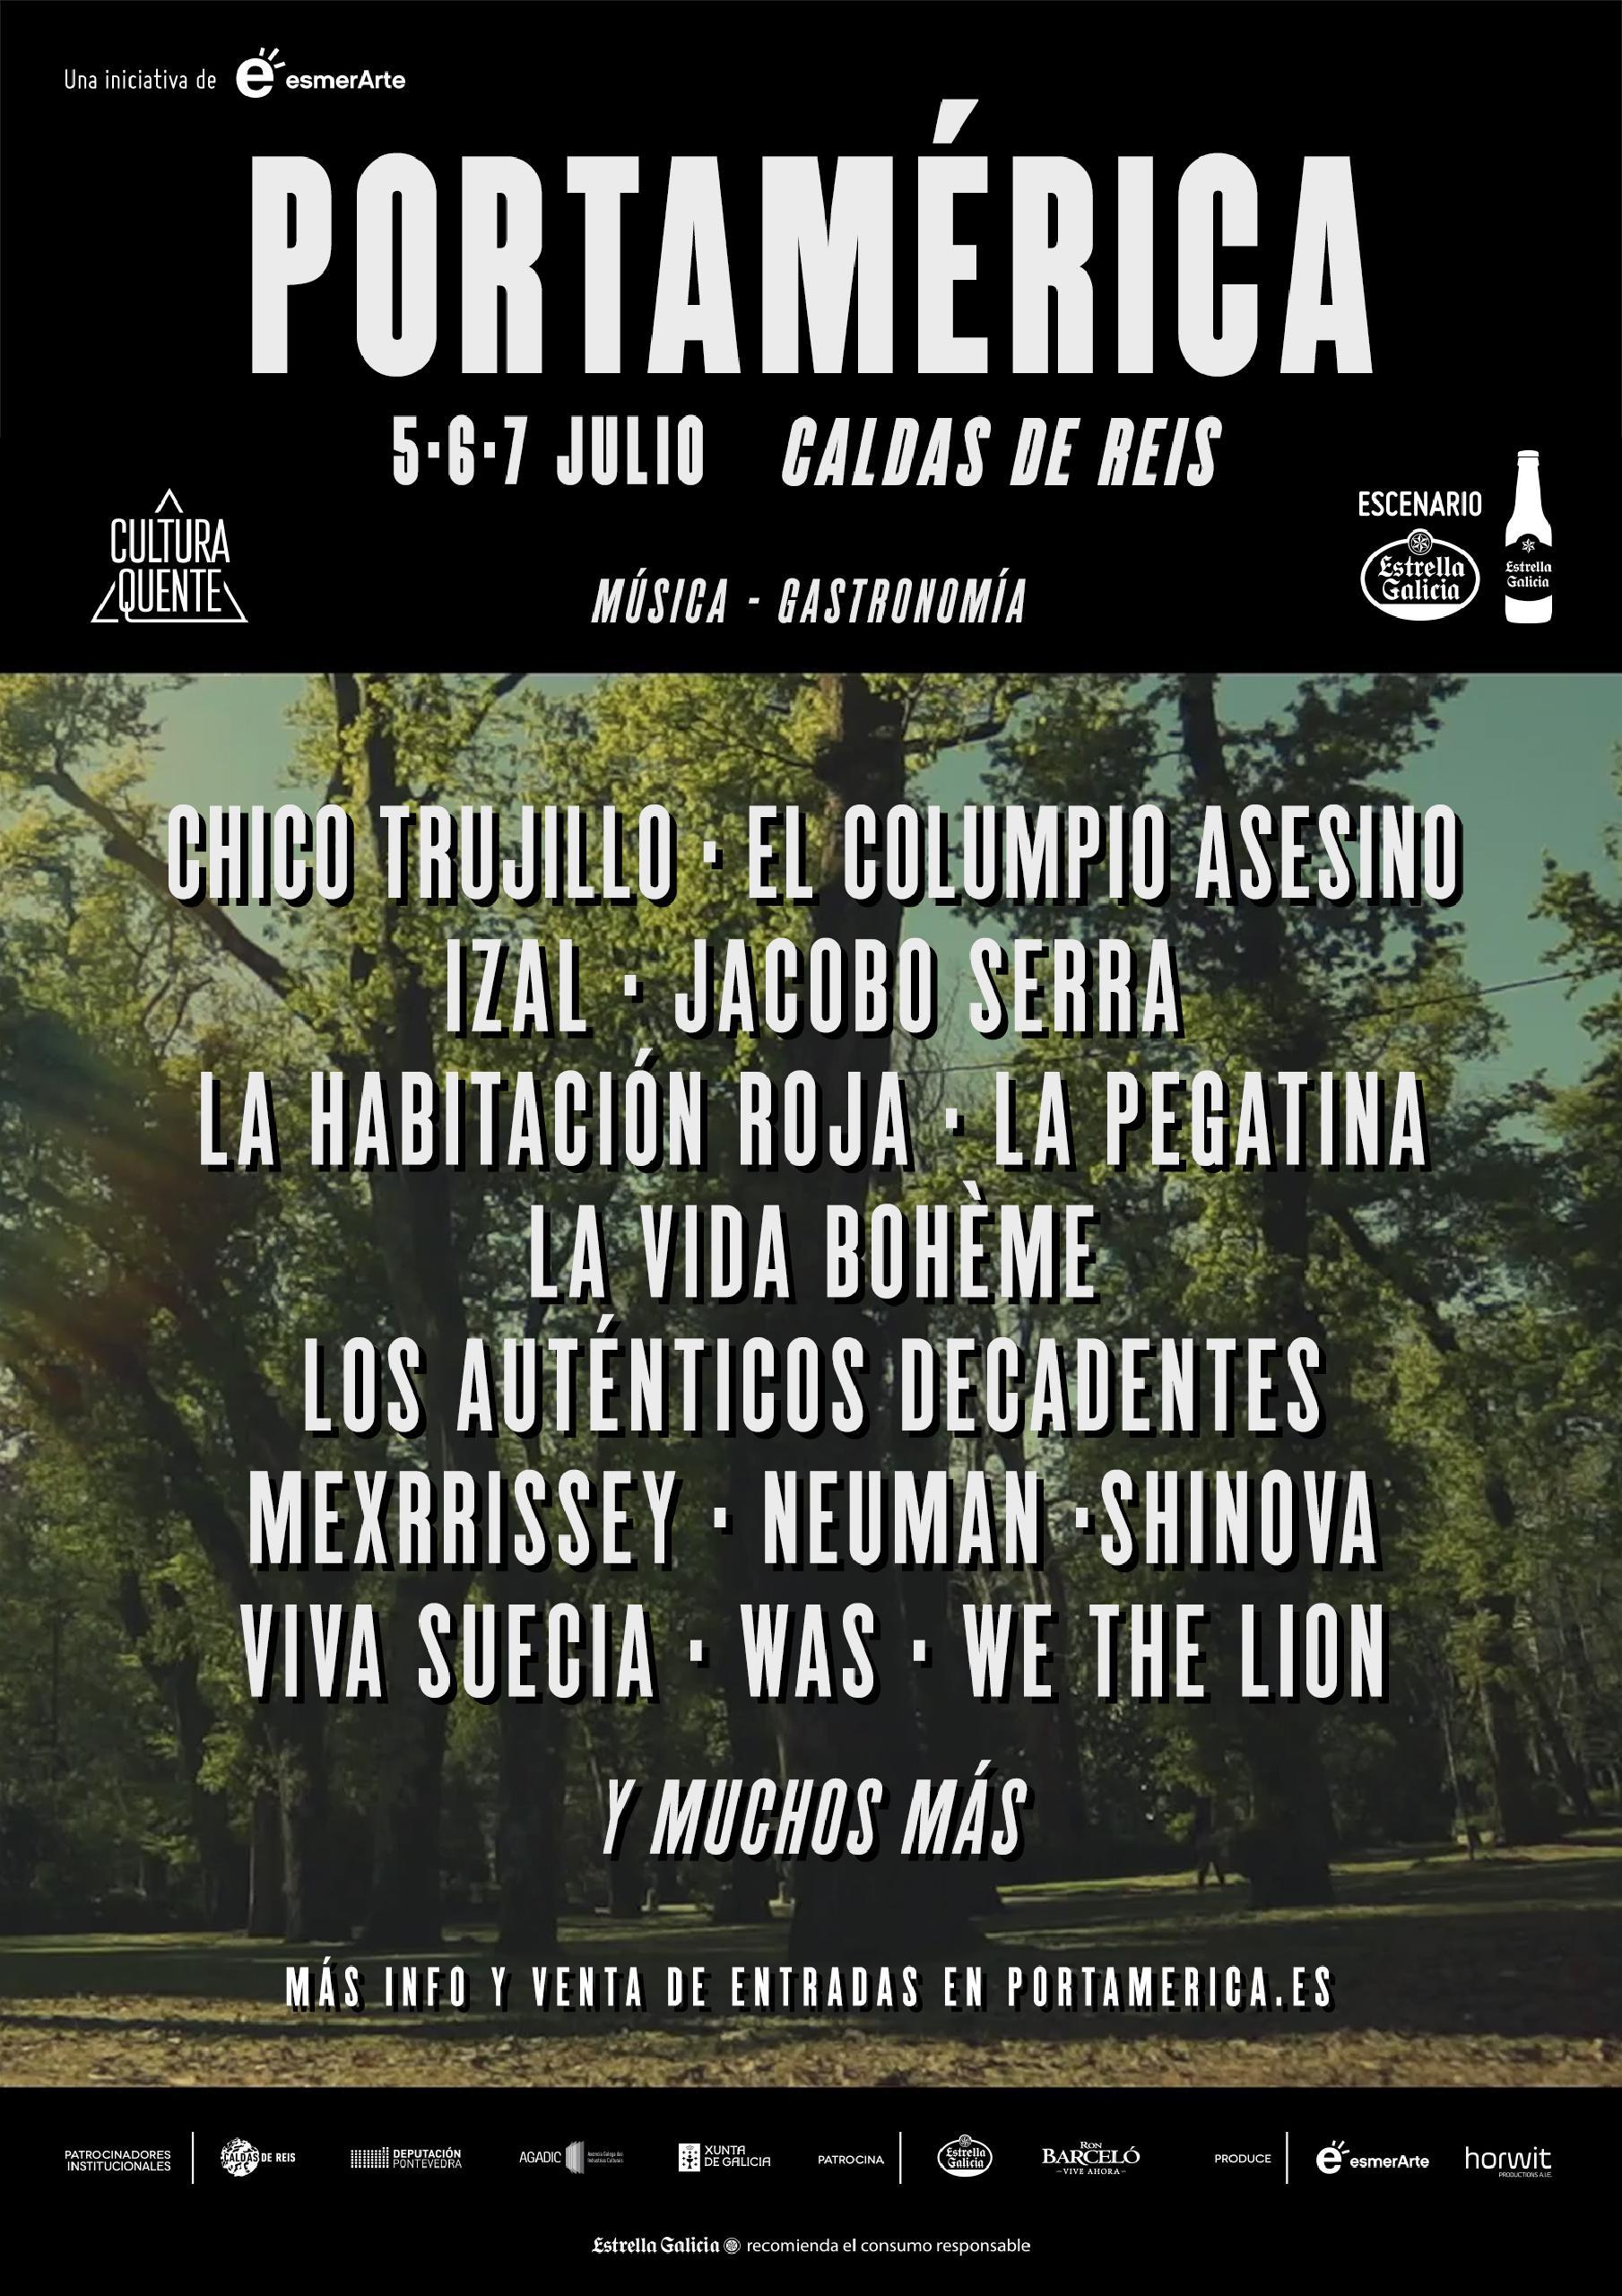 Cartel festival Portamerica 2018